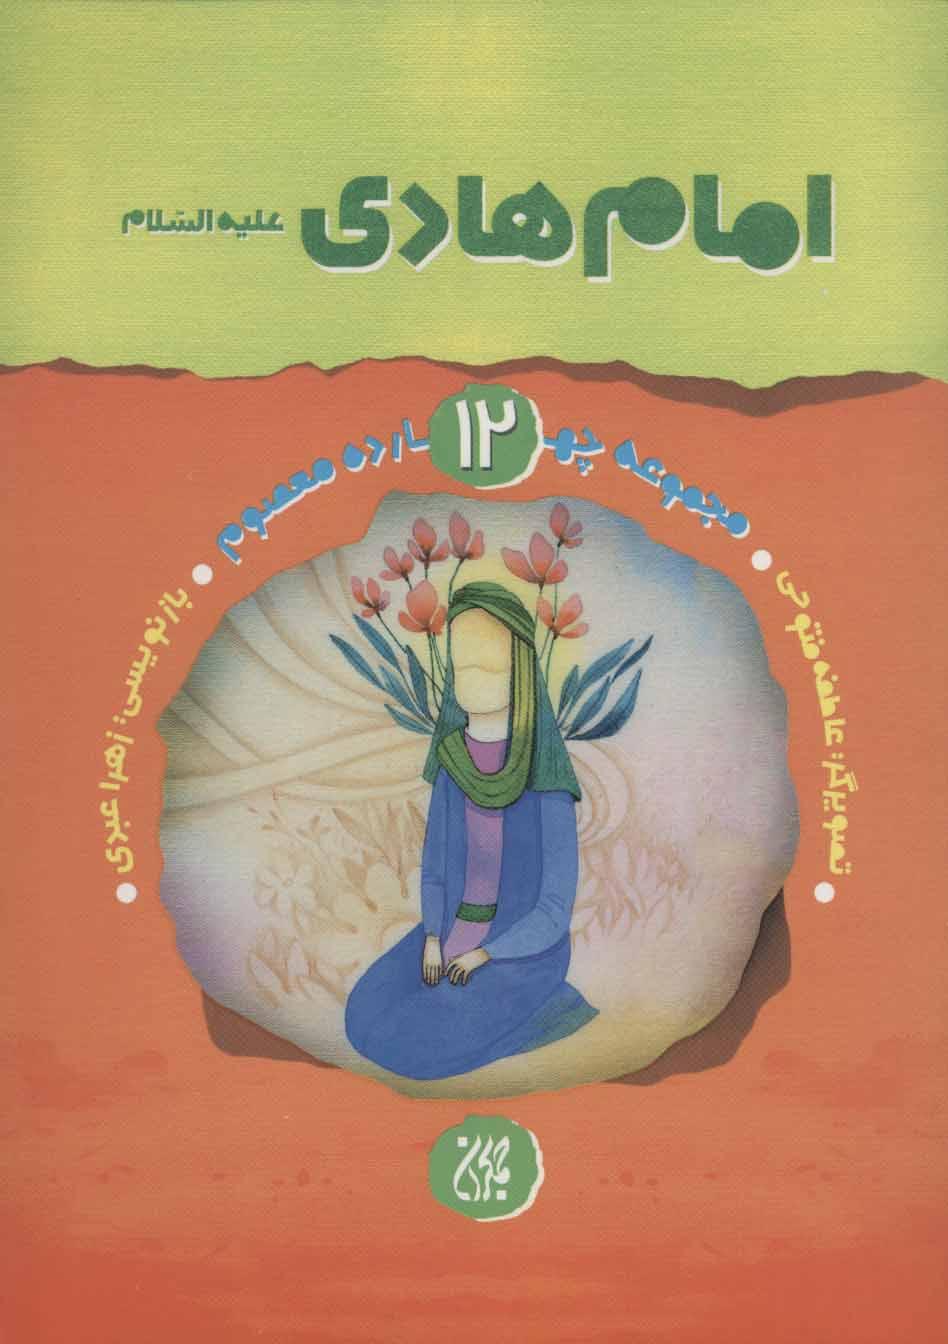 کتاب امام هادی (علیهالسلام)